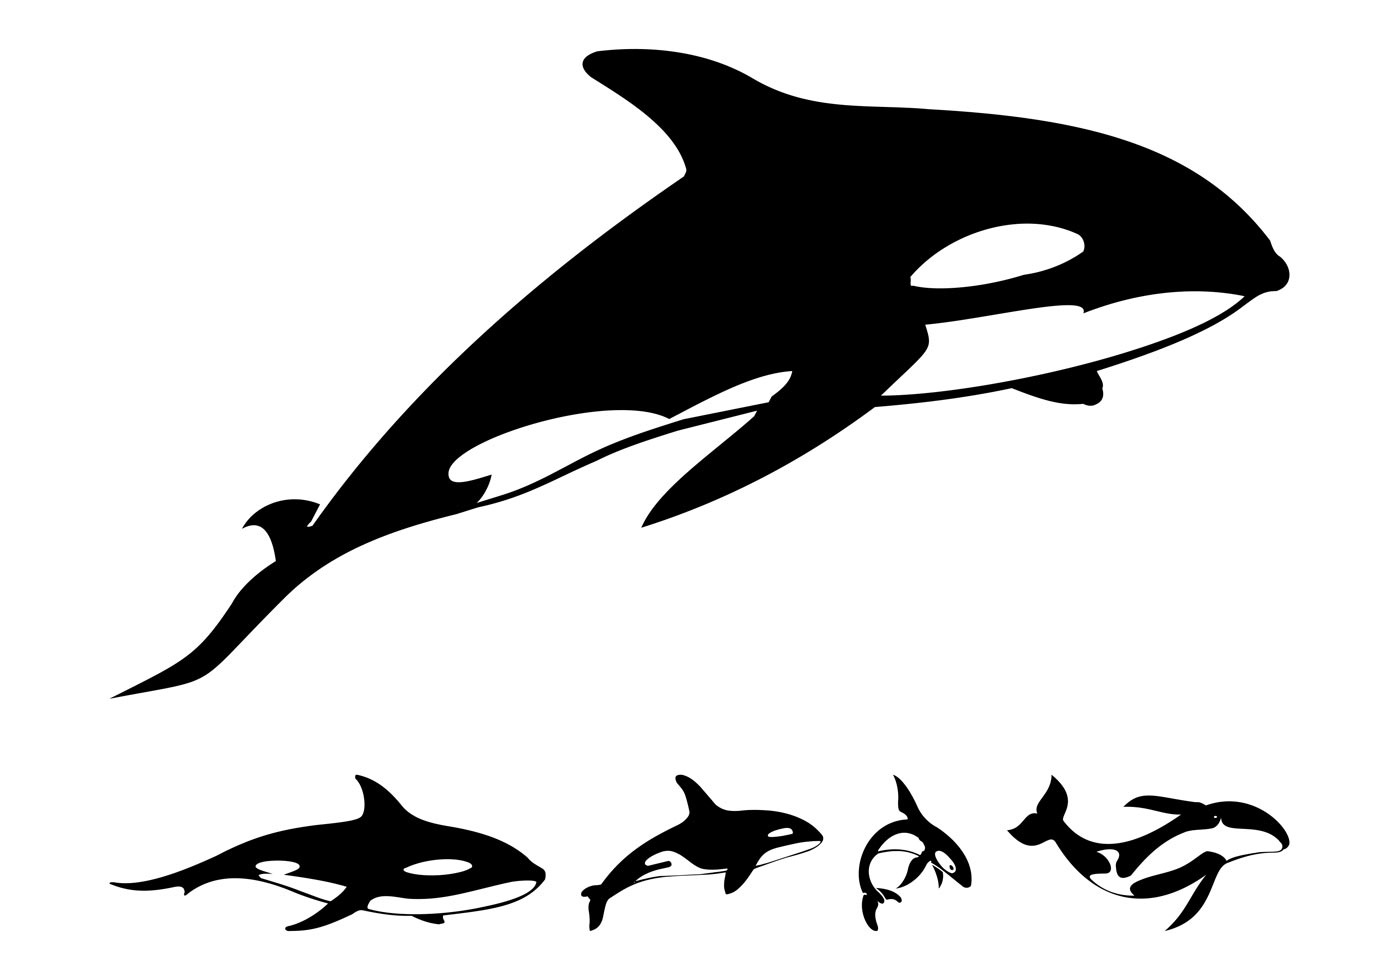 1400x980 Whale Silhouette Free Vector Art